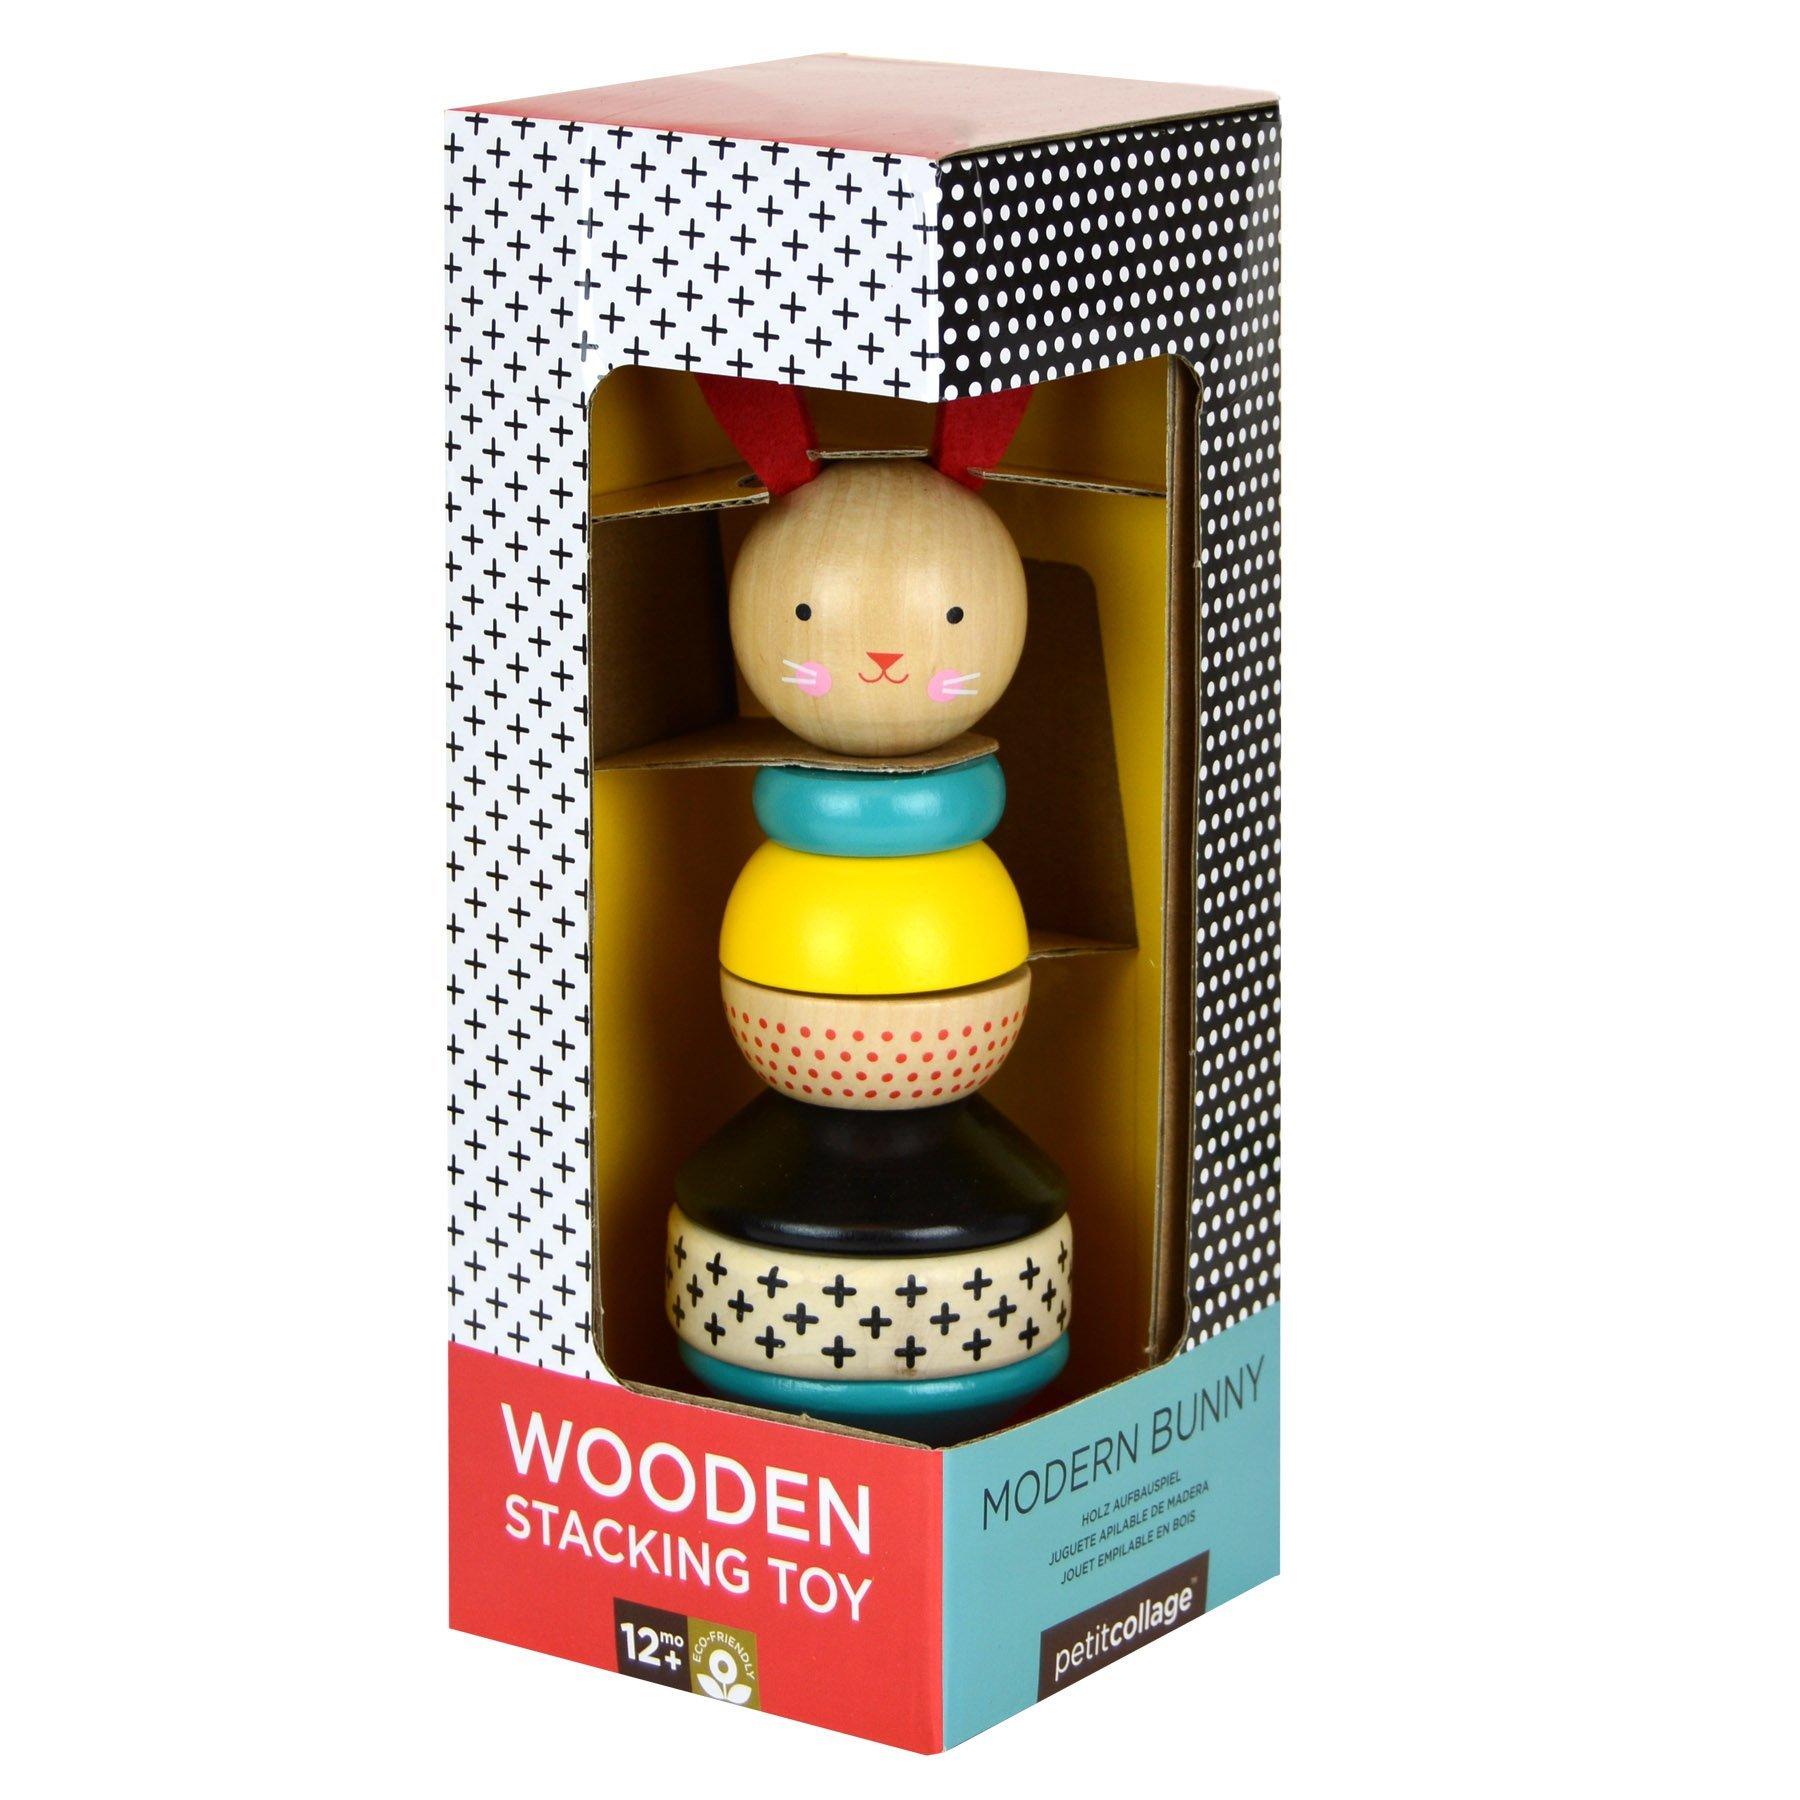 PETIT COLLAGE Modern Bunny Wood Stacking Toy 1.jpg